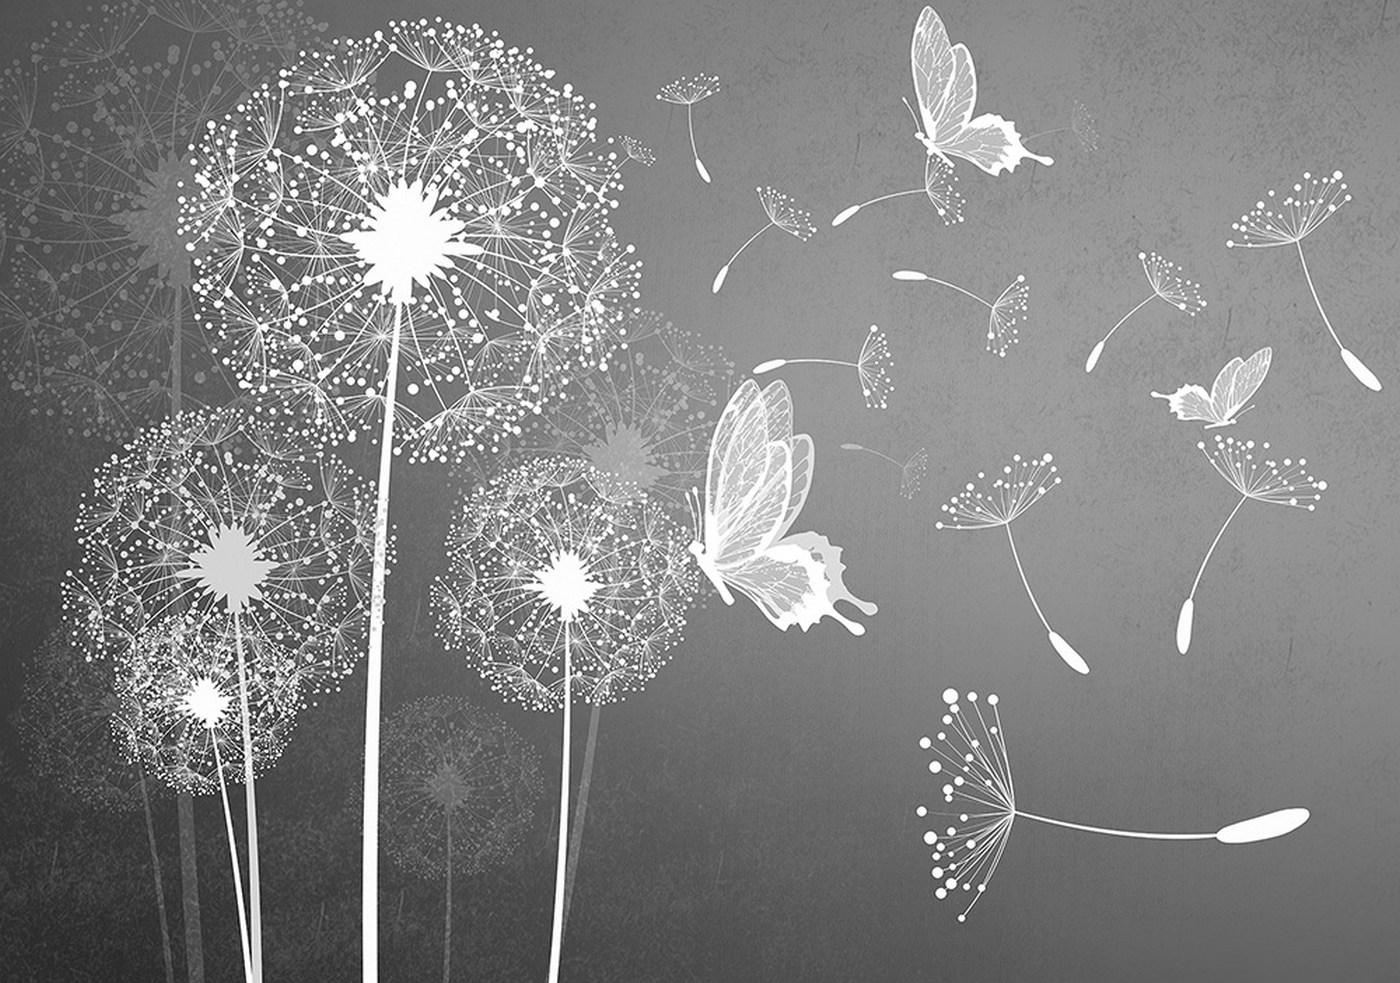 Vlies Fototapete  Pflanzen Tapete Pusteblume Blume Pflanze Schmetterling Malerei Grau